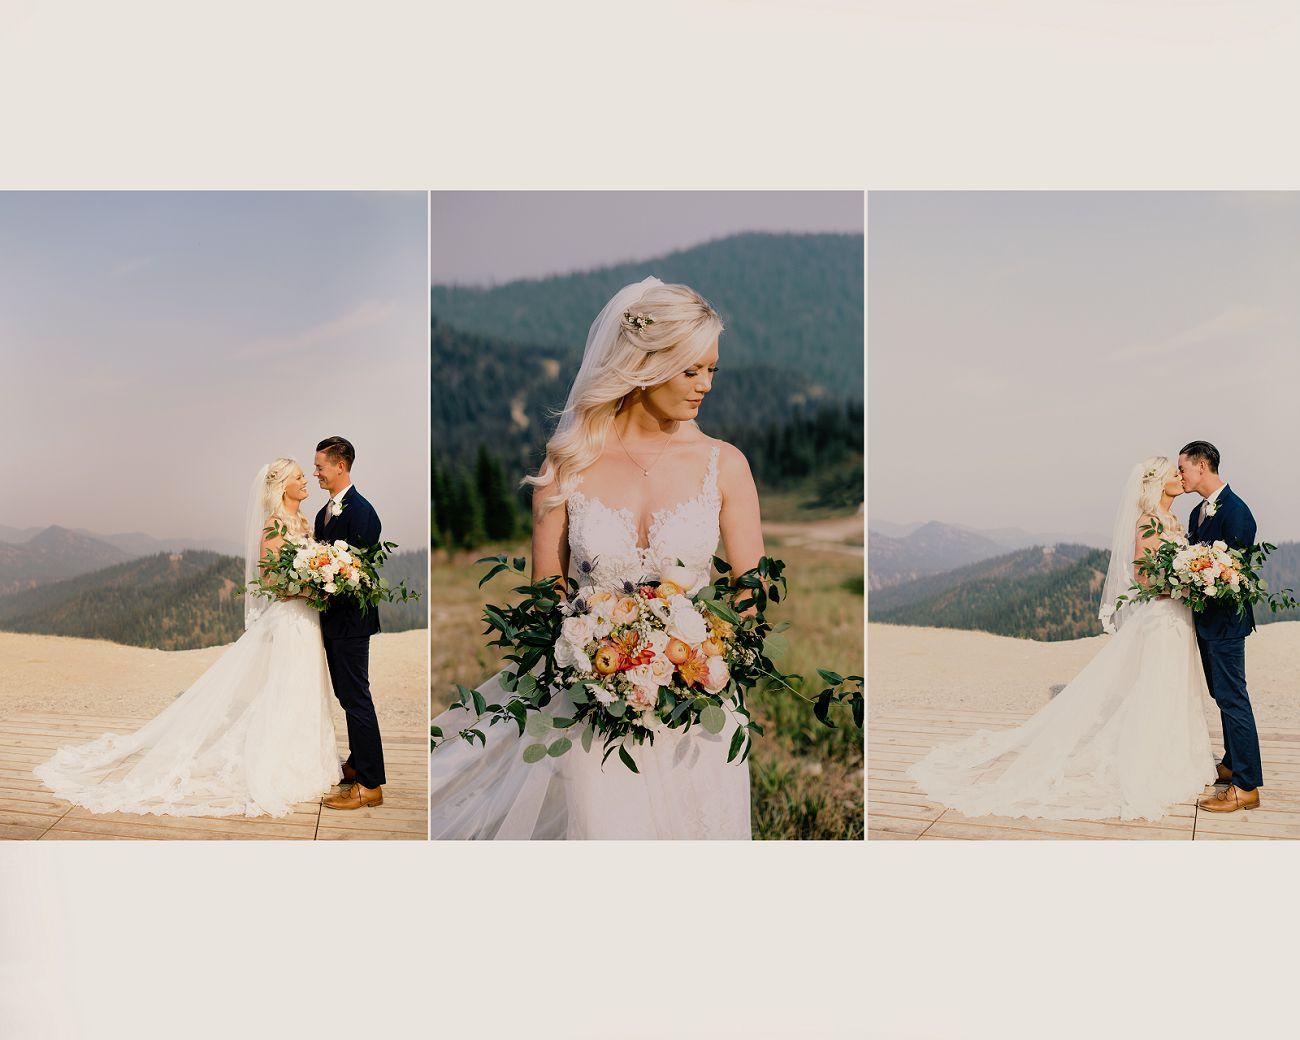 Jennifer_Mooney_Photo_Whitefish_mountain_resort_wedding_elegant_montana_wedding_008.jpg